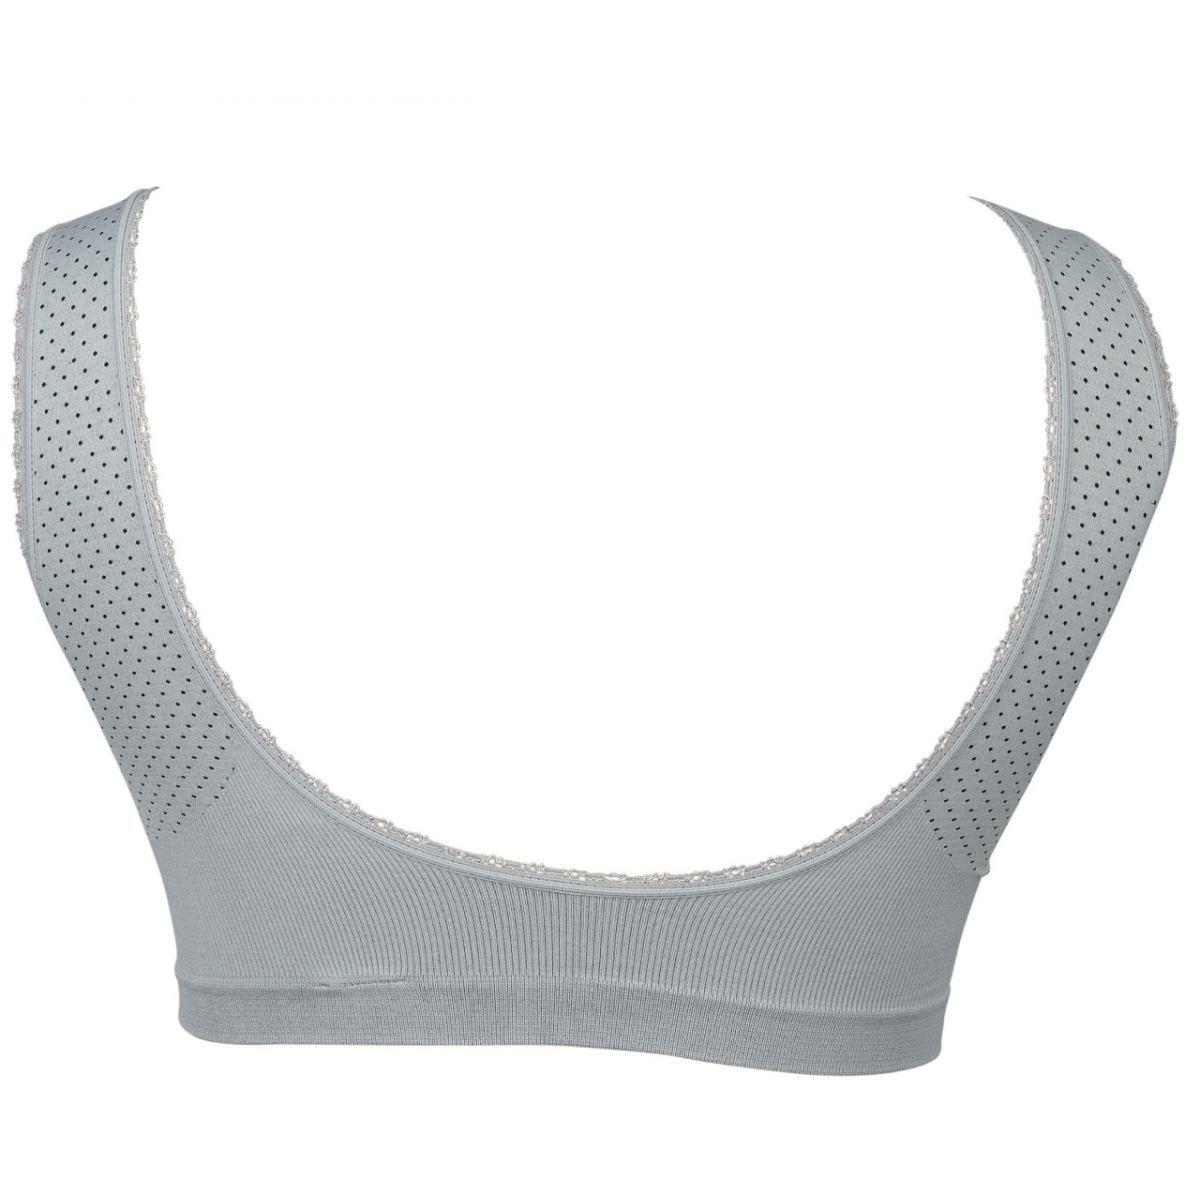 Бюстгальтер для беременных Anita 5197, серебро